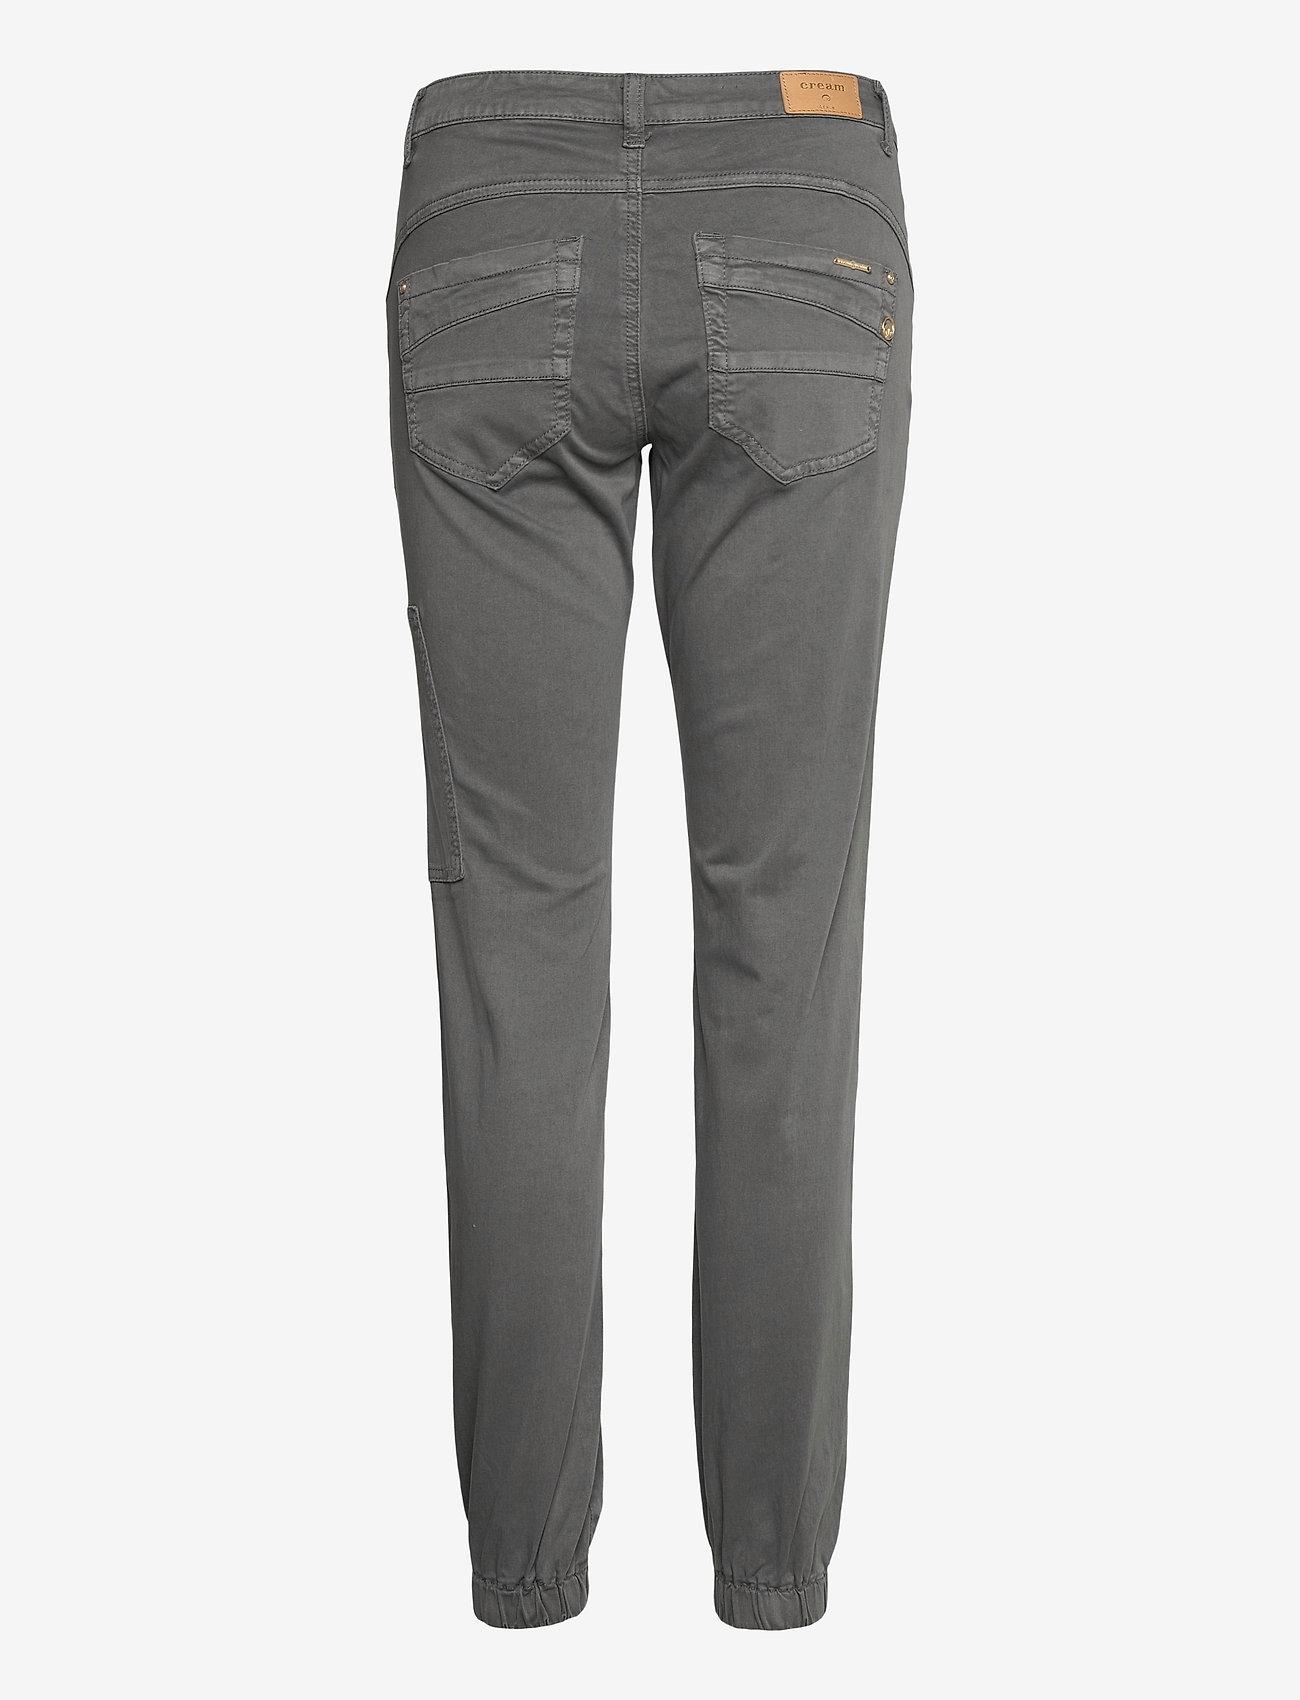 Cream - CRDafnie Jeans - Coco Fit - straight regular - eiffel tower - 1